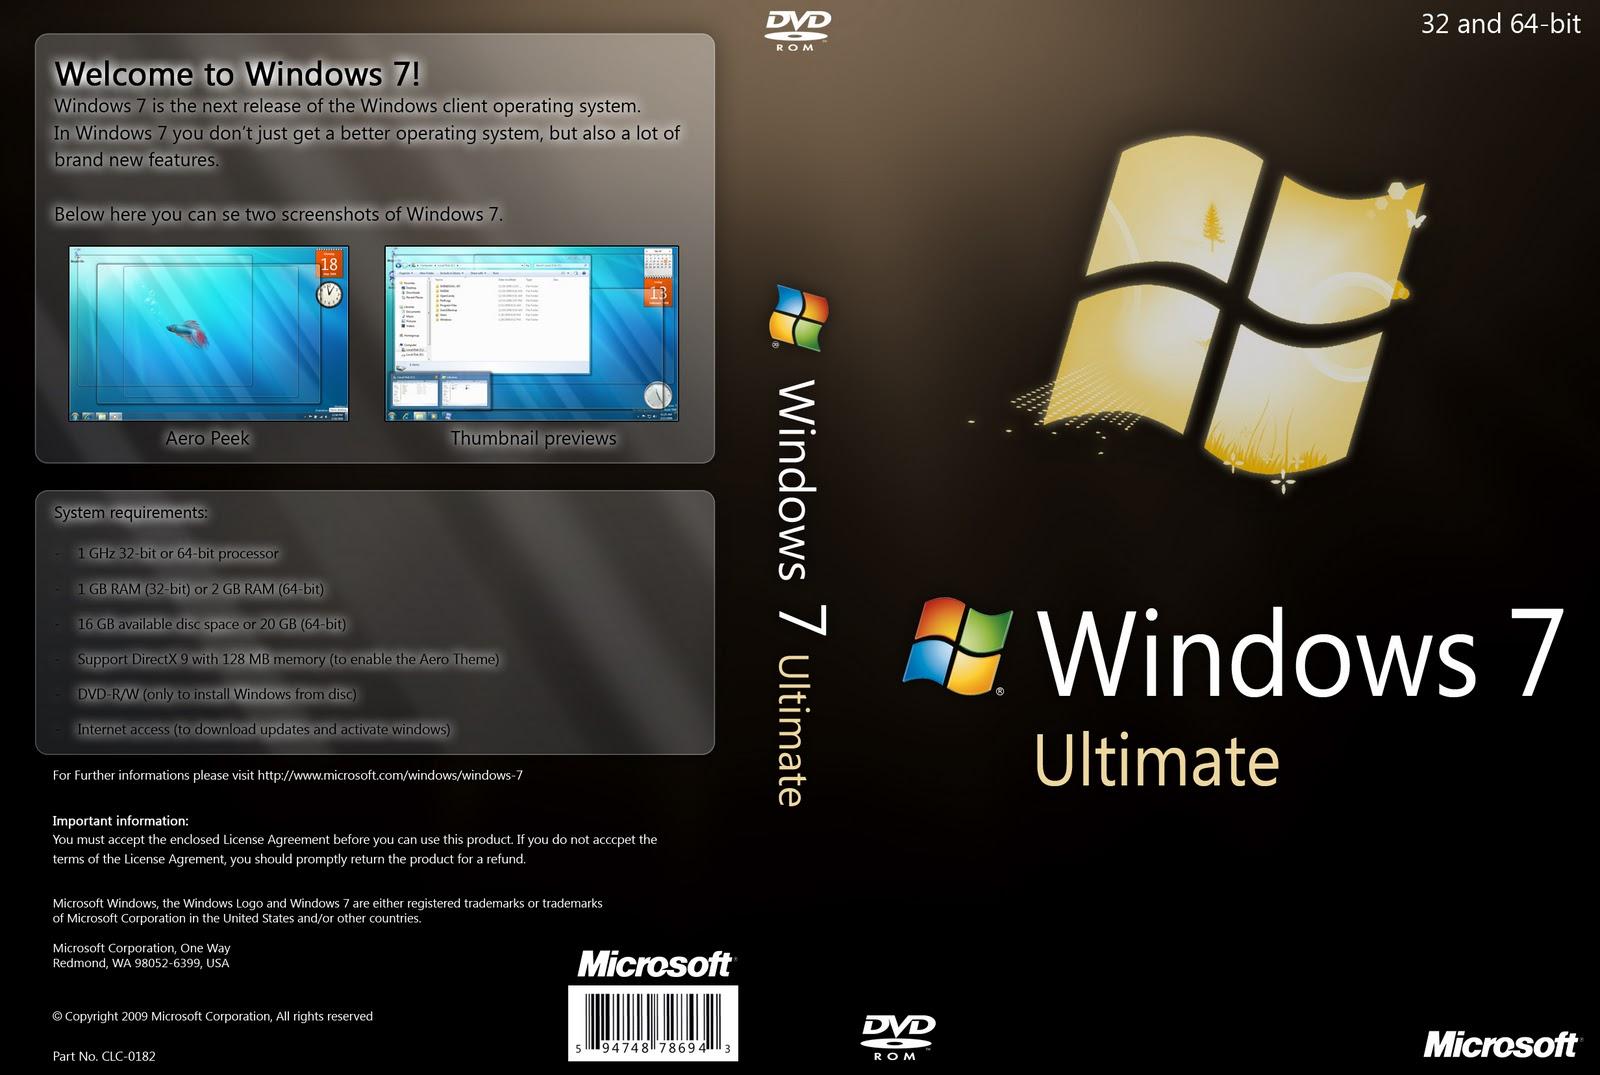 download windows 7 ultimate sp1 iso 32 64 bit